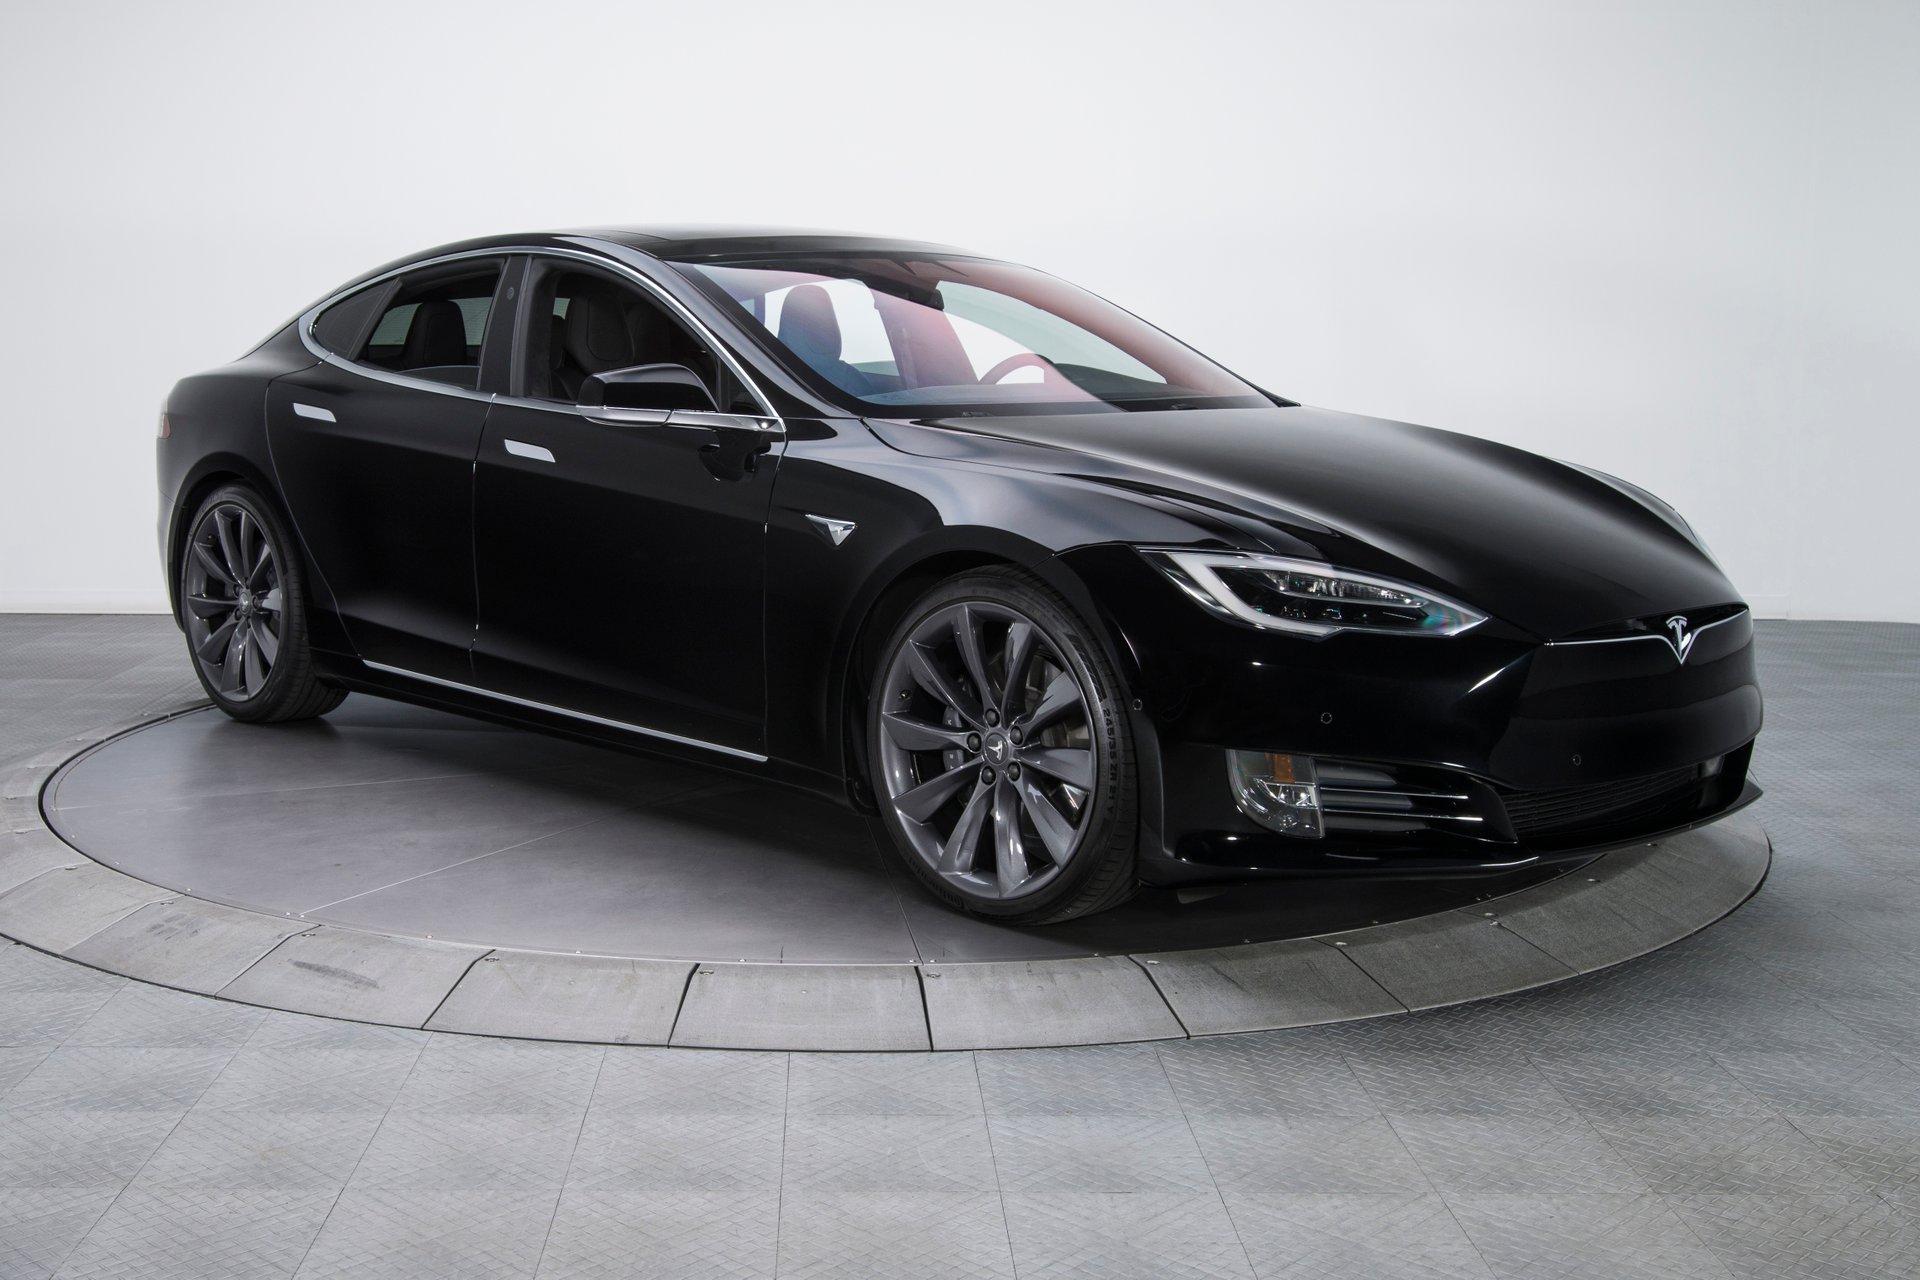 136107 2017 Tesla Model S Rk Motors Classic Cars For Sale